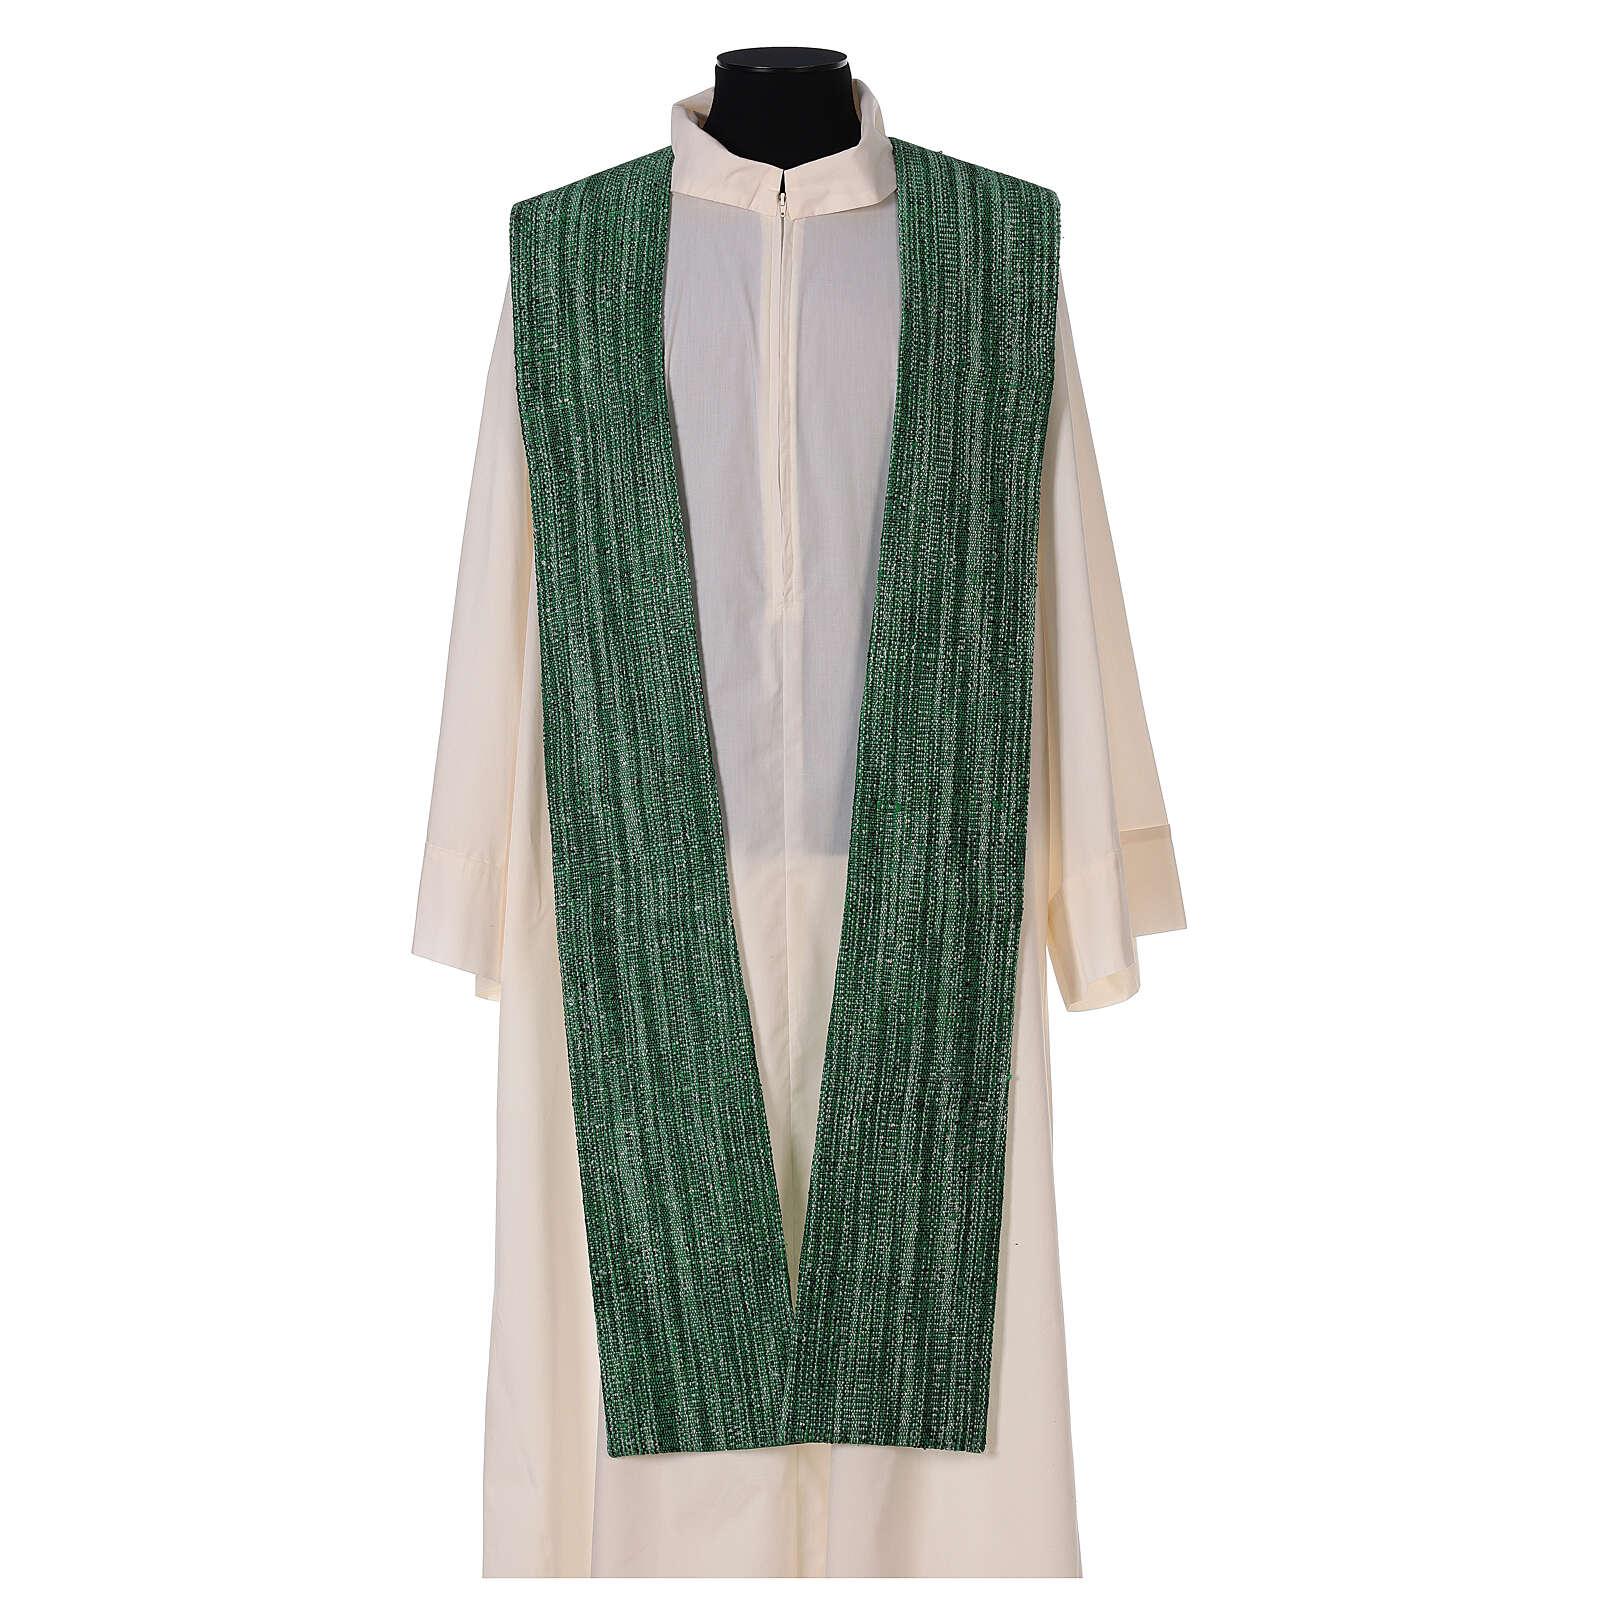 Orphrey Saint Francis 55% silk 45% viscose 4